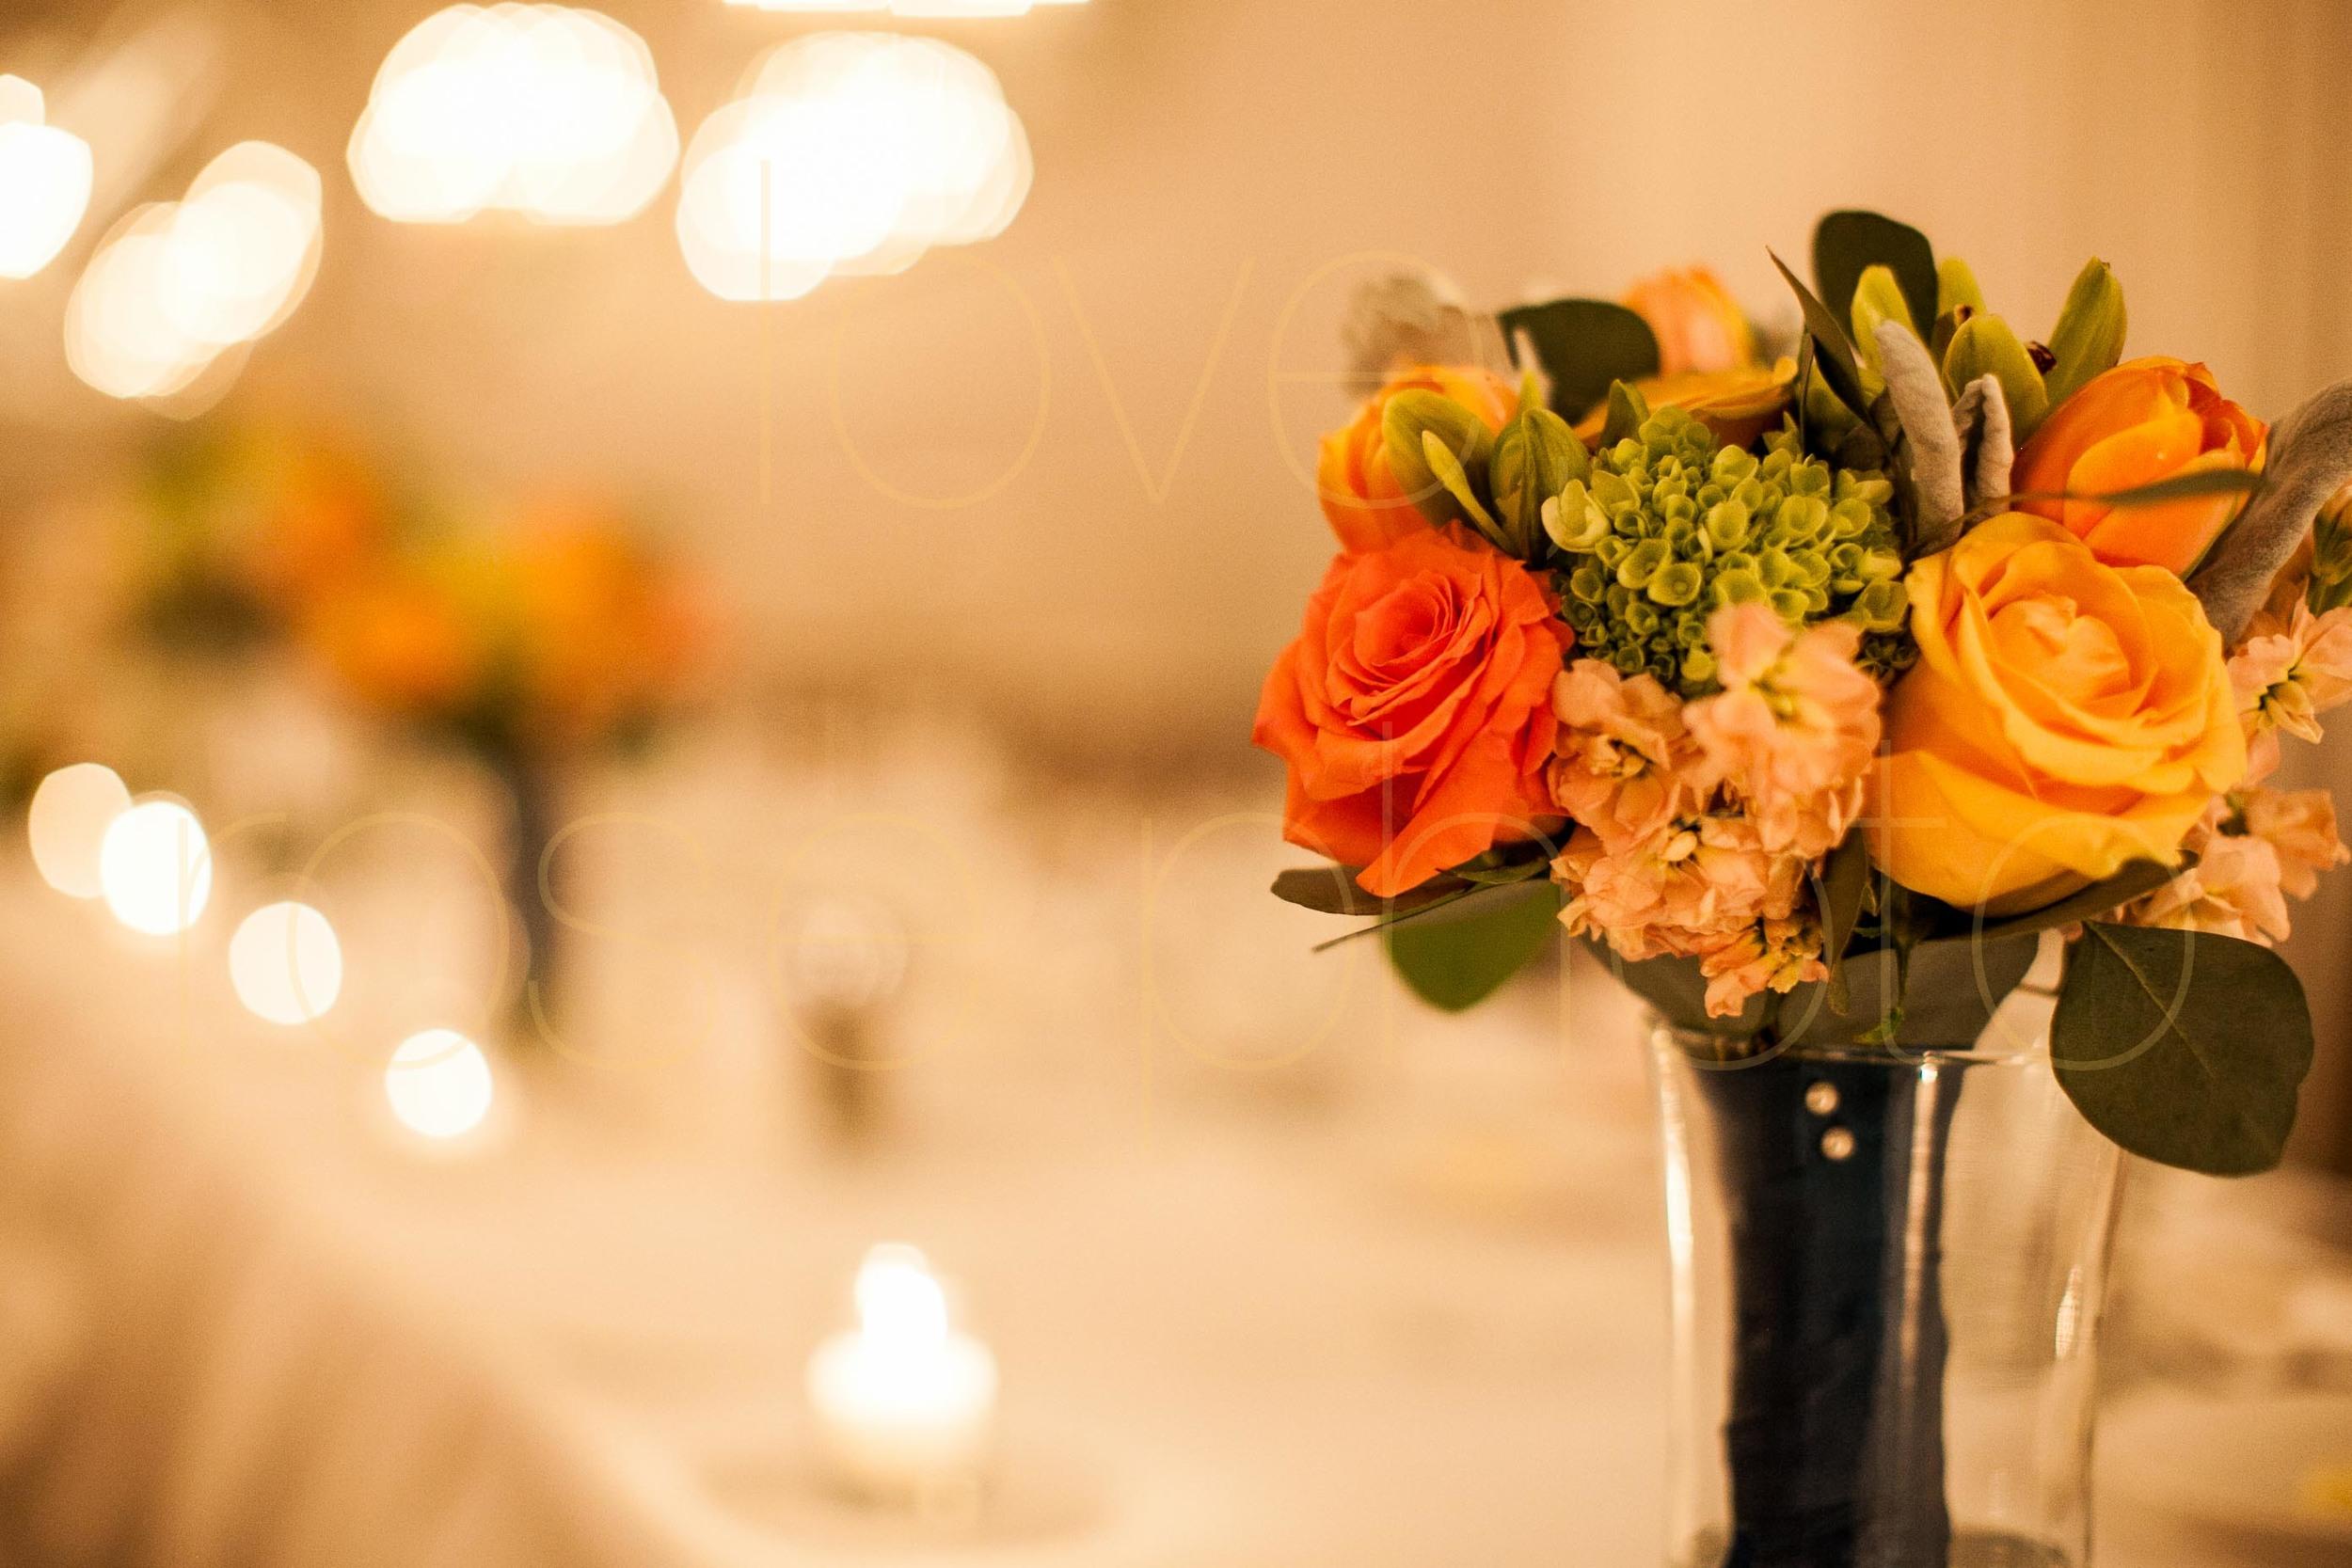 K Bianci maple chaple summer wedding chicago photographer -0350.jpg